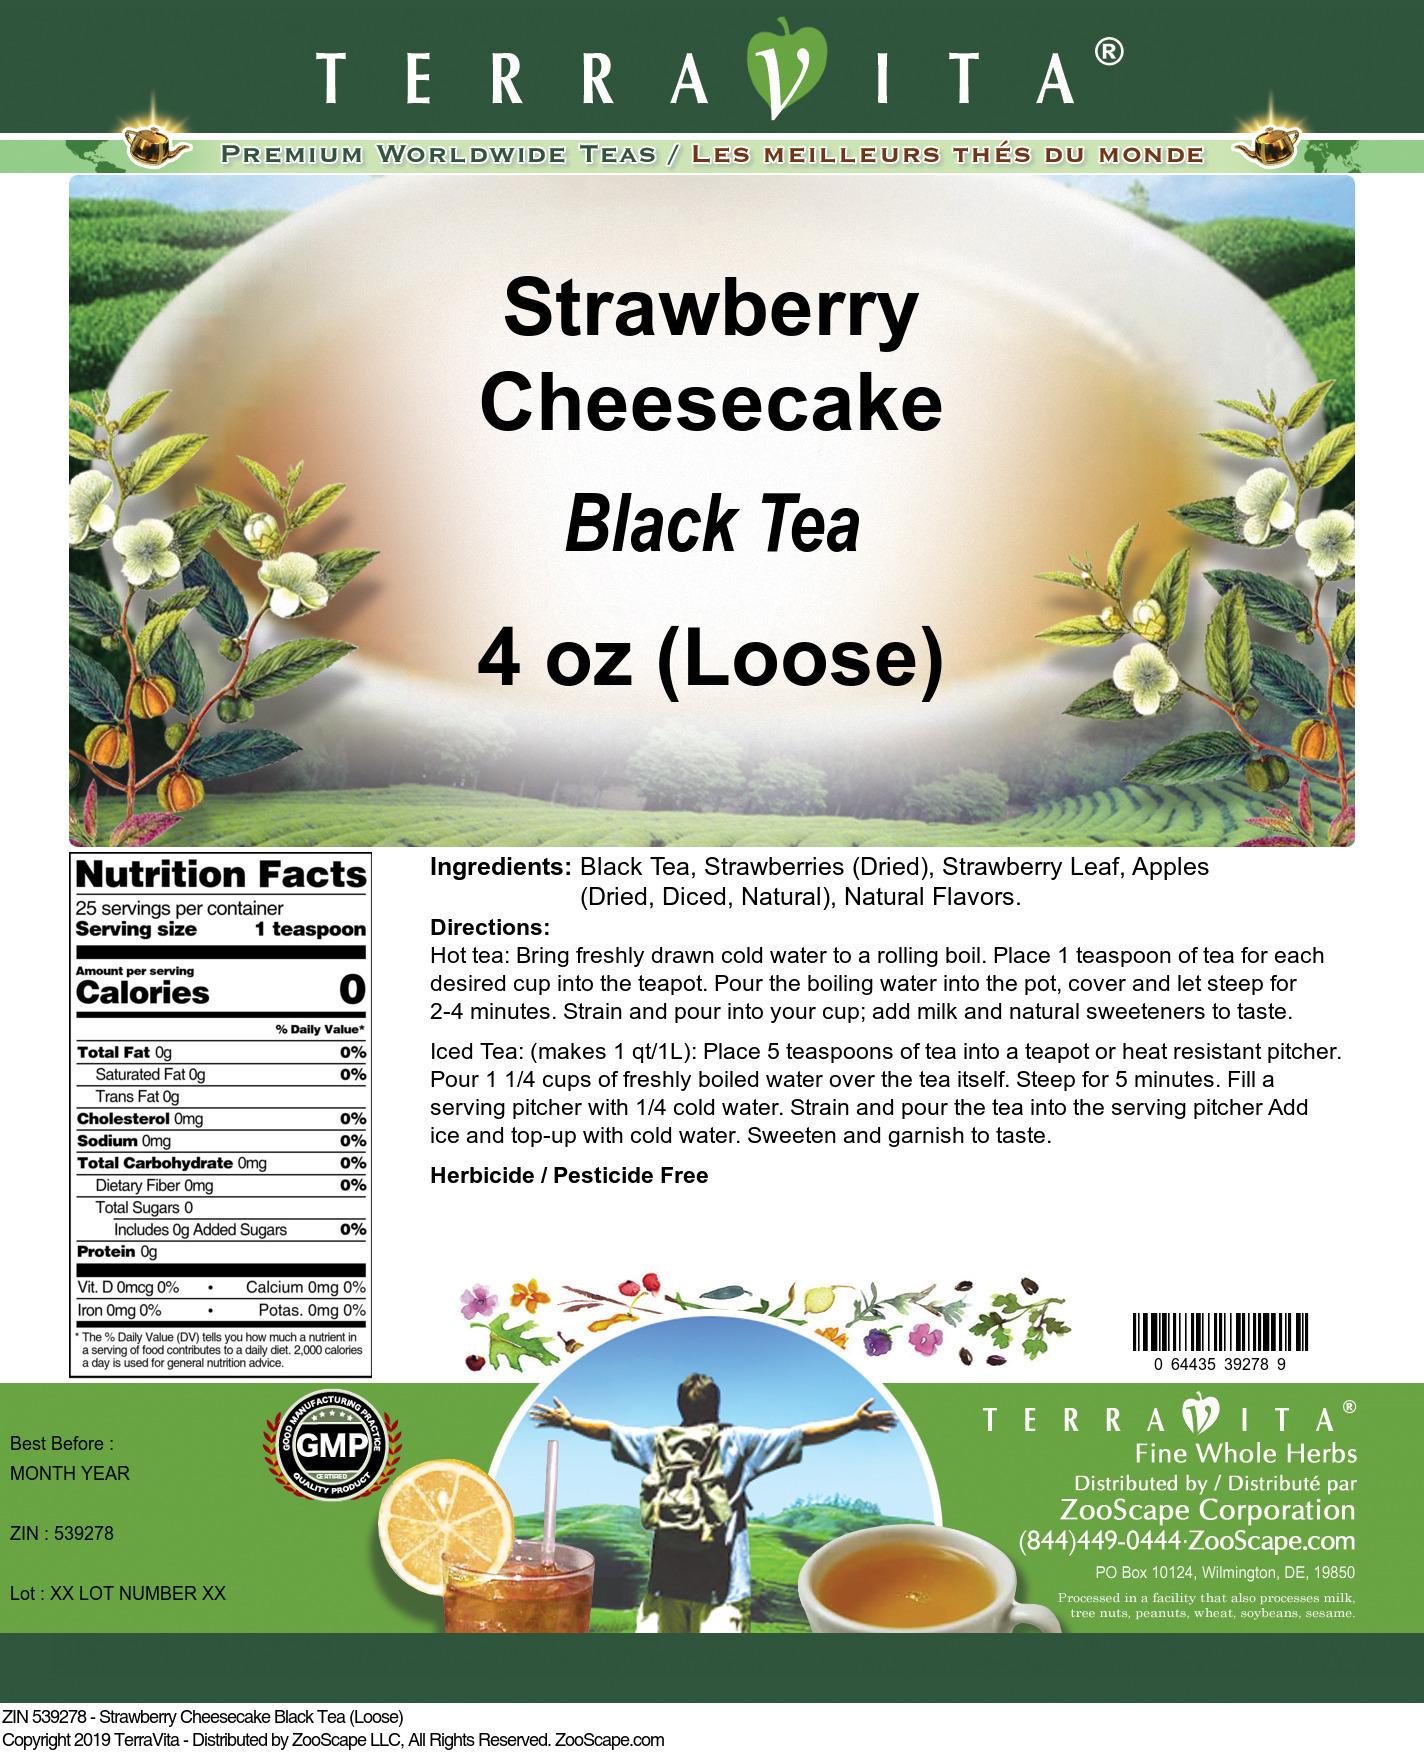 Strawberry Cheesecake Black Tea